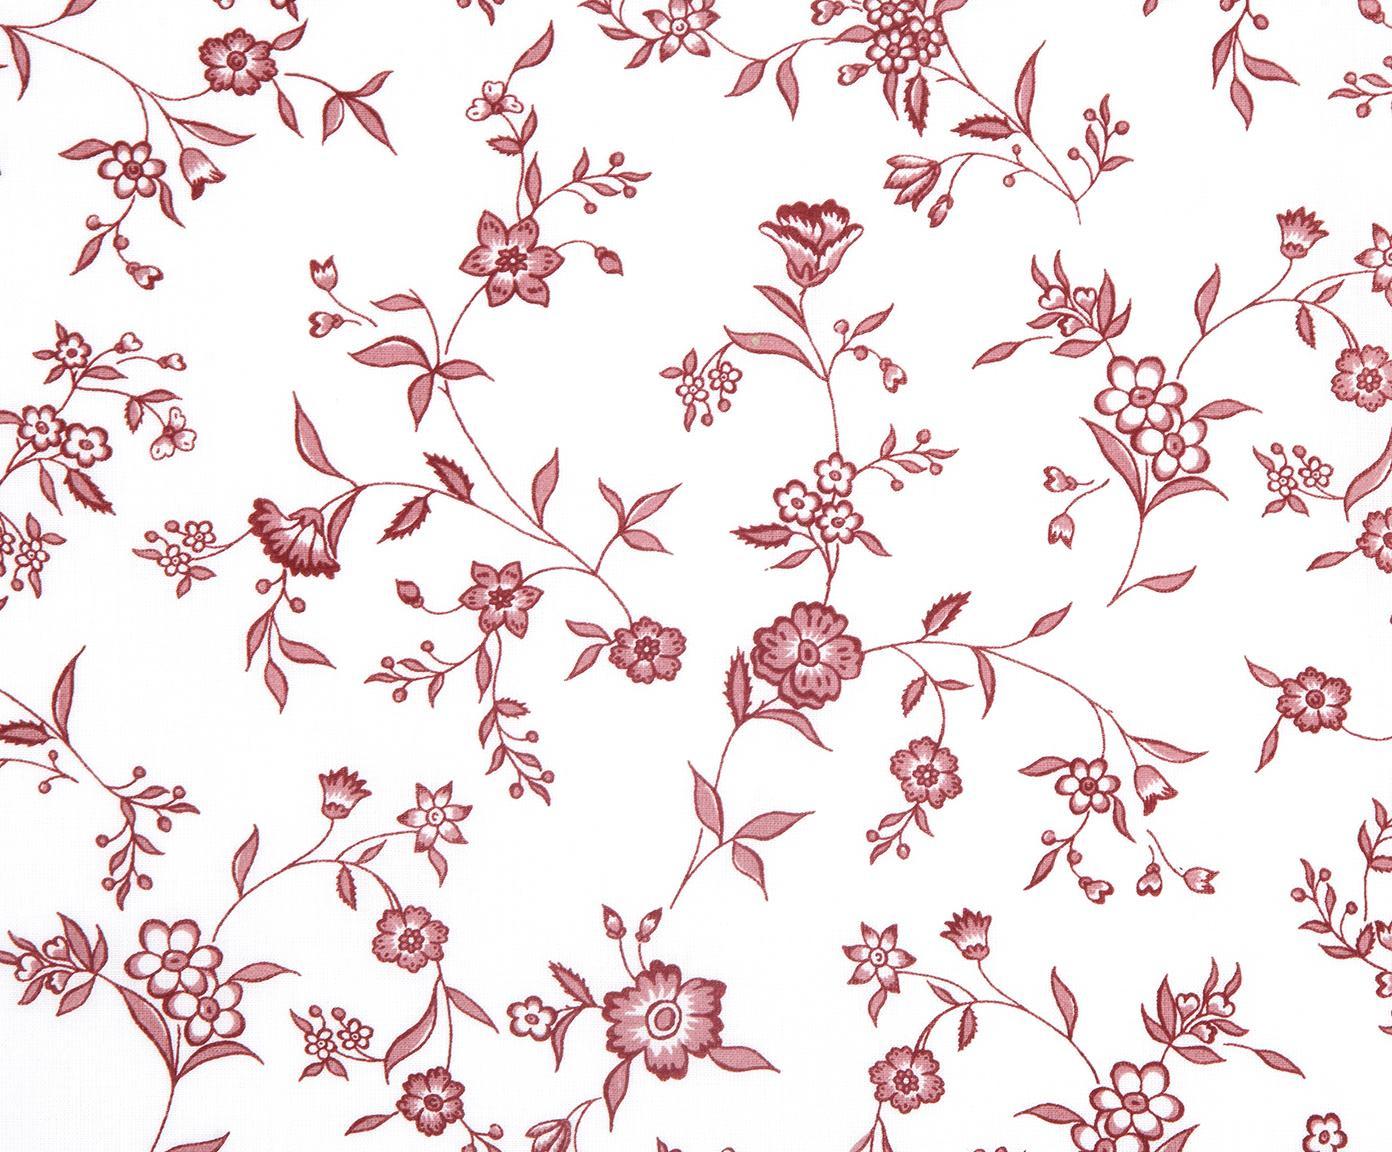 Renforcé-Bettwäsche Anja mit Blumenmuster, Webart: Renforcé, Weiss, Rot, 240 x 220 cm